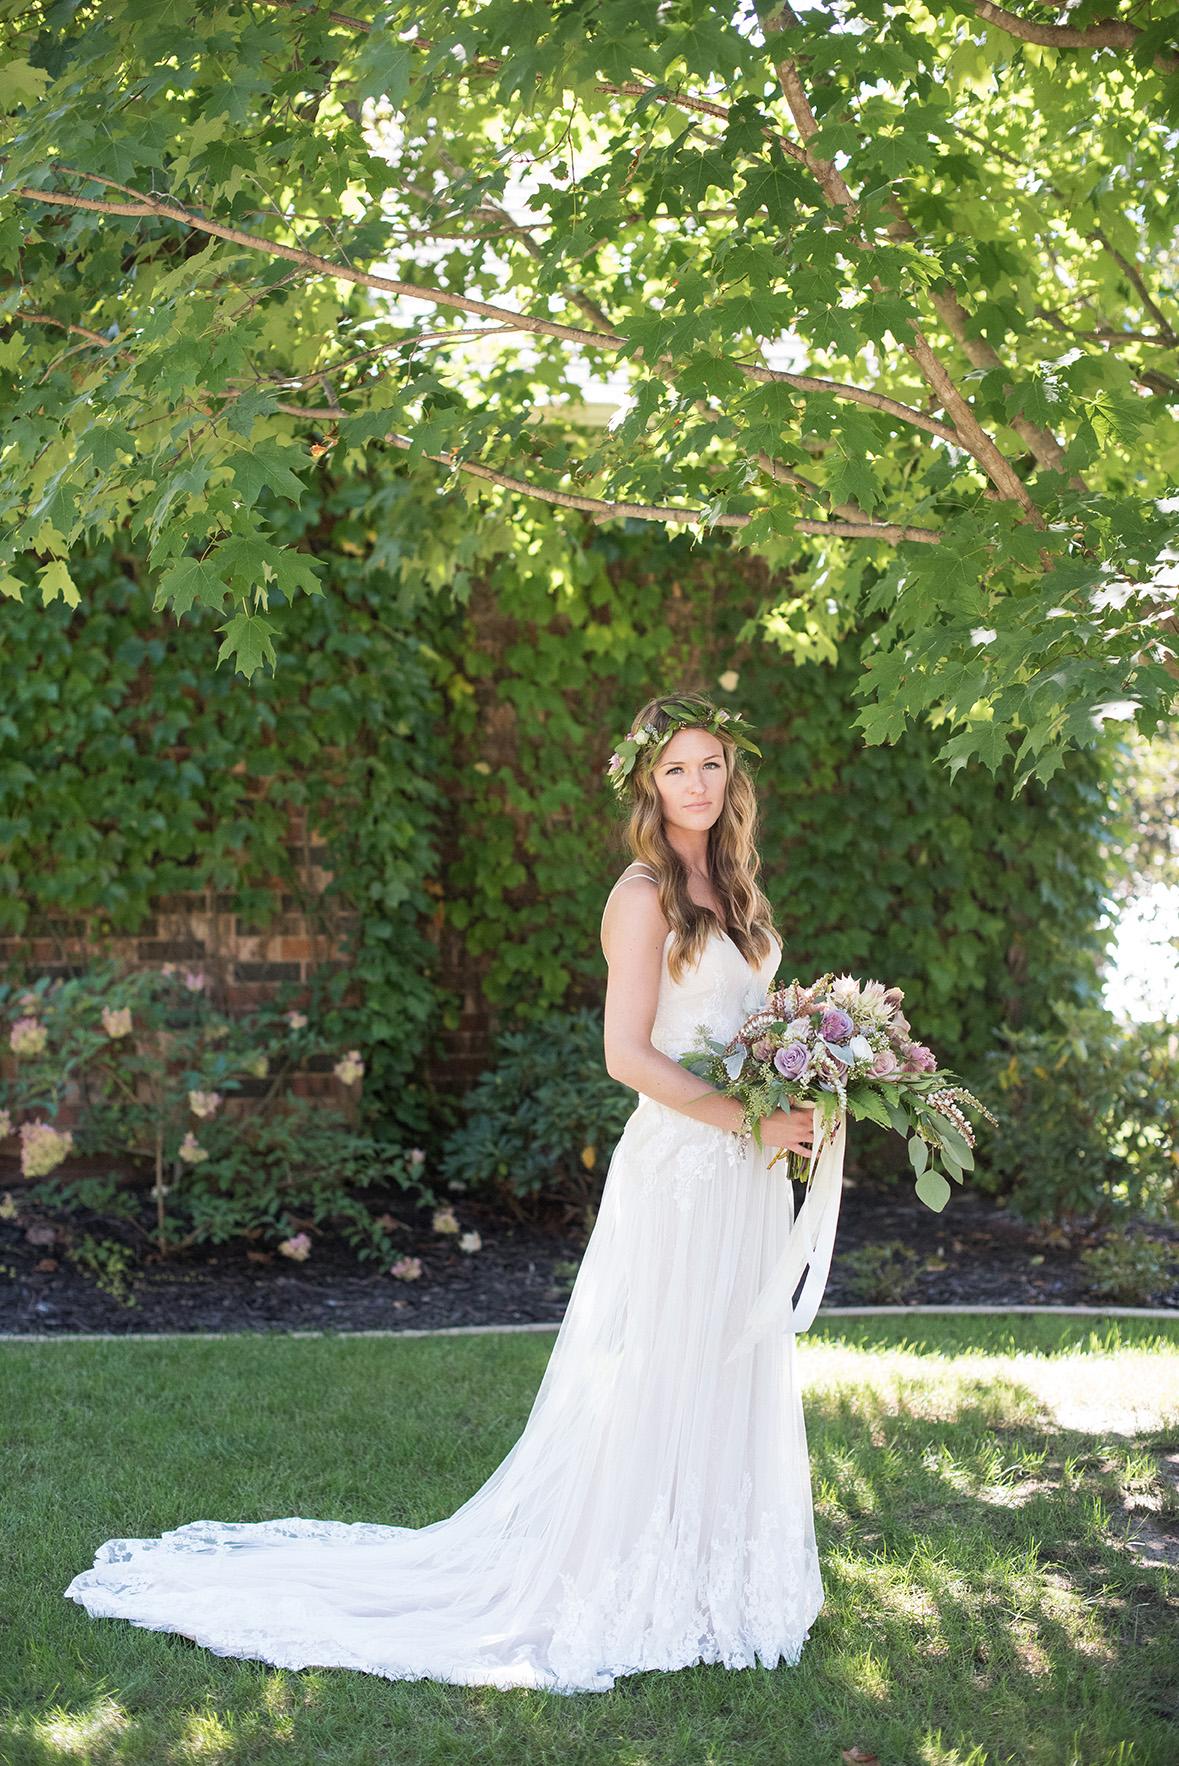 paige + grant - heartland wedding ideas cover